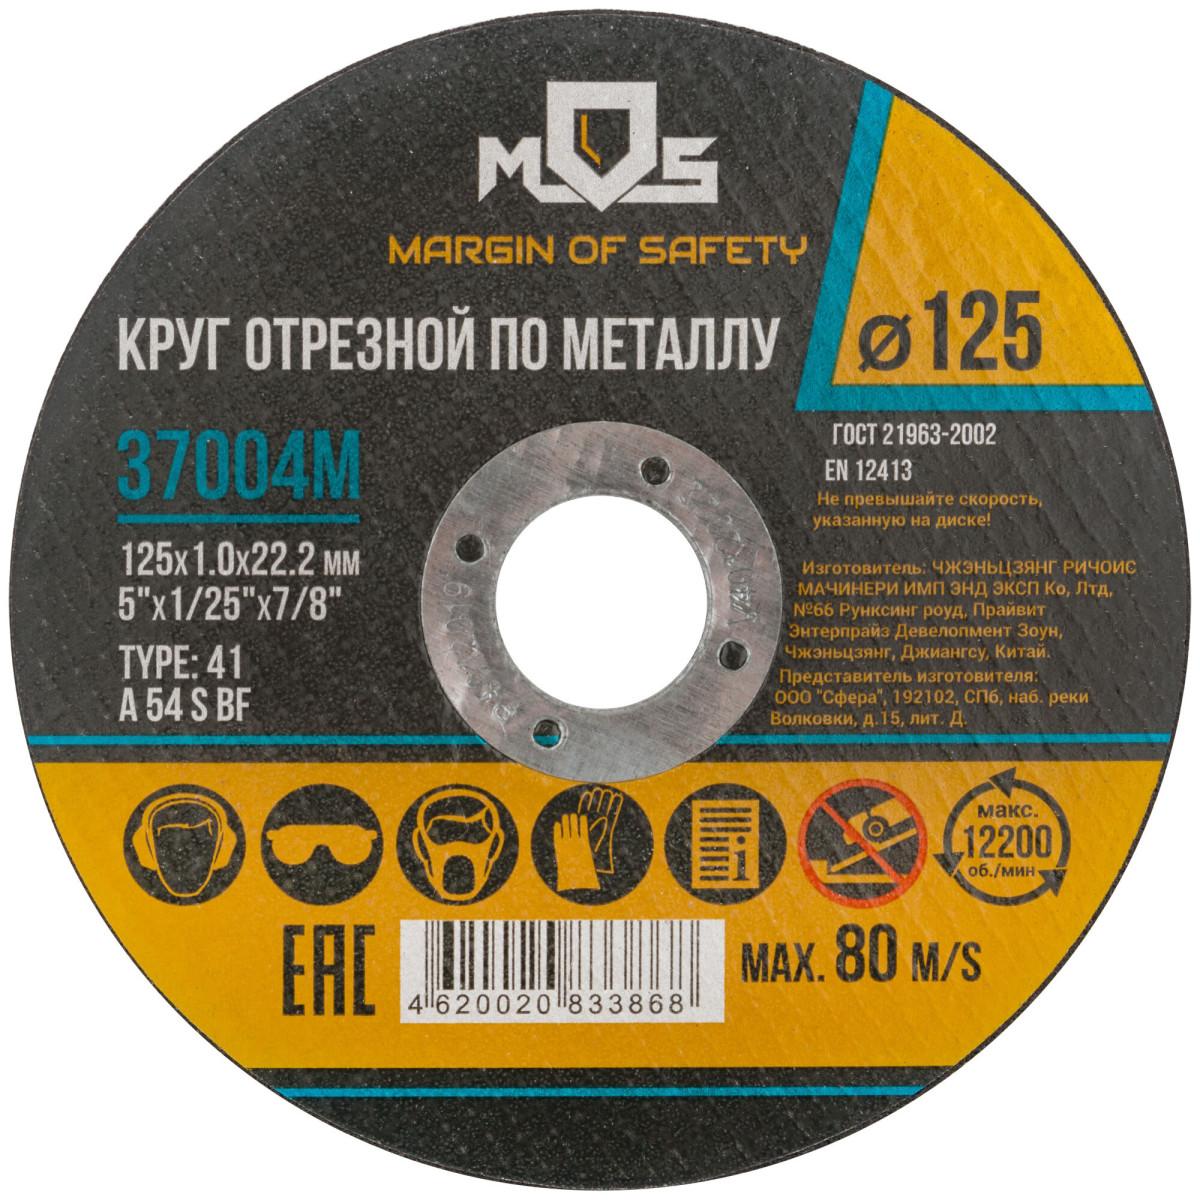 Круг отрезной по металлу 37004M 125х1 мм